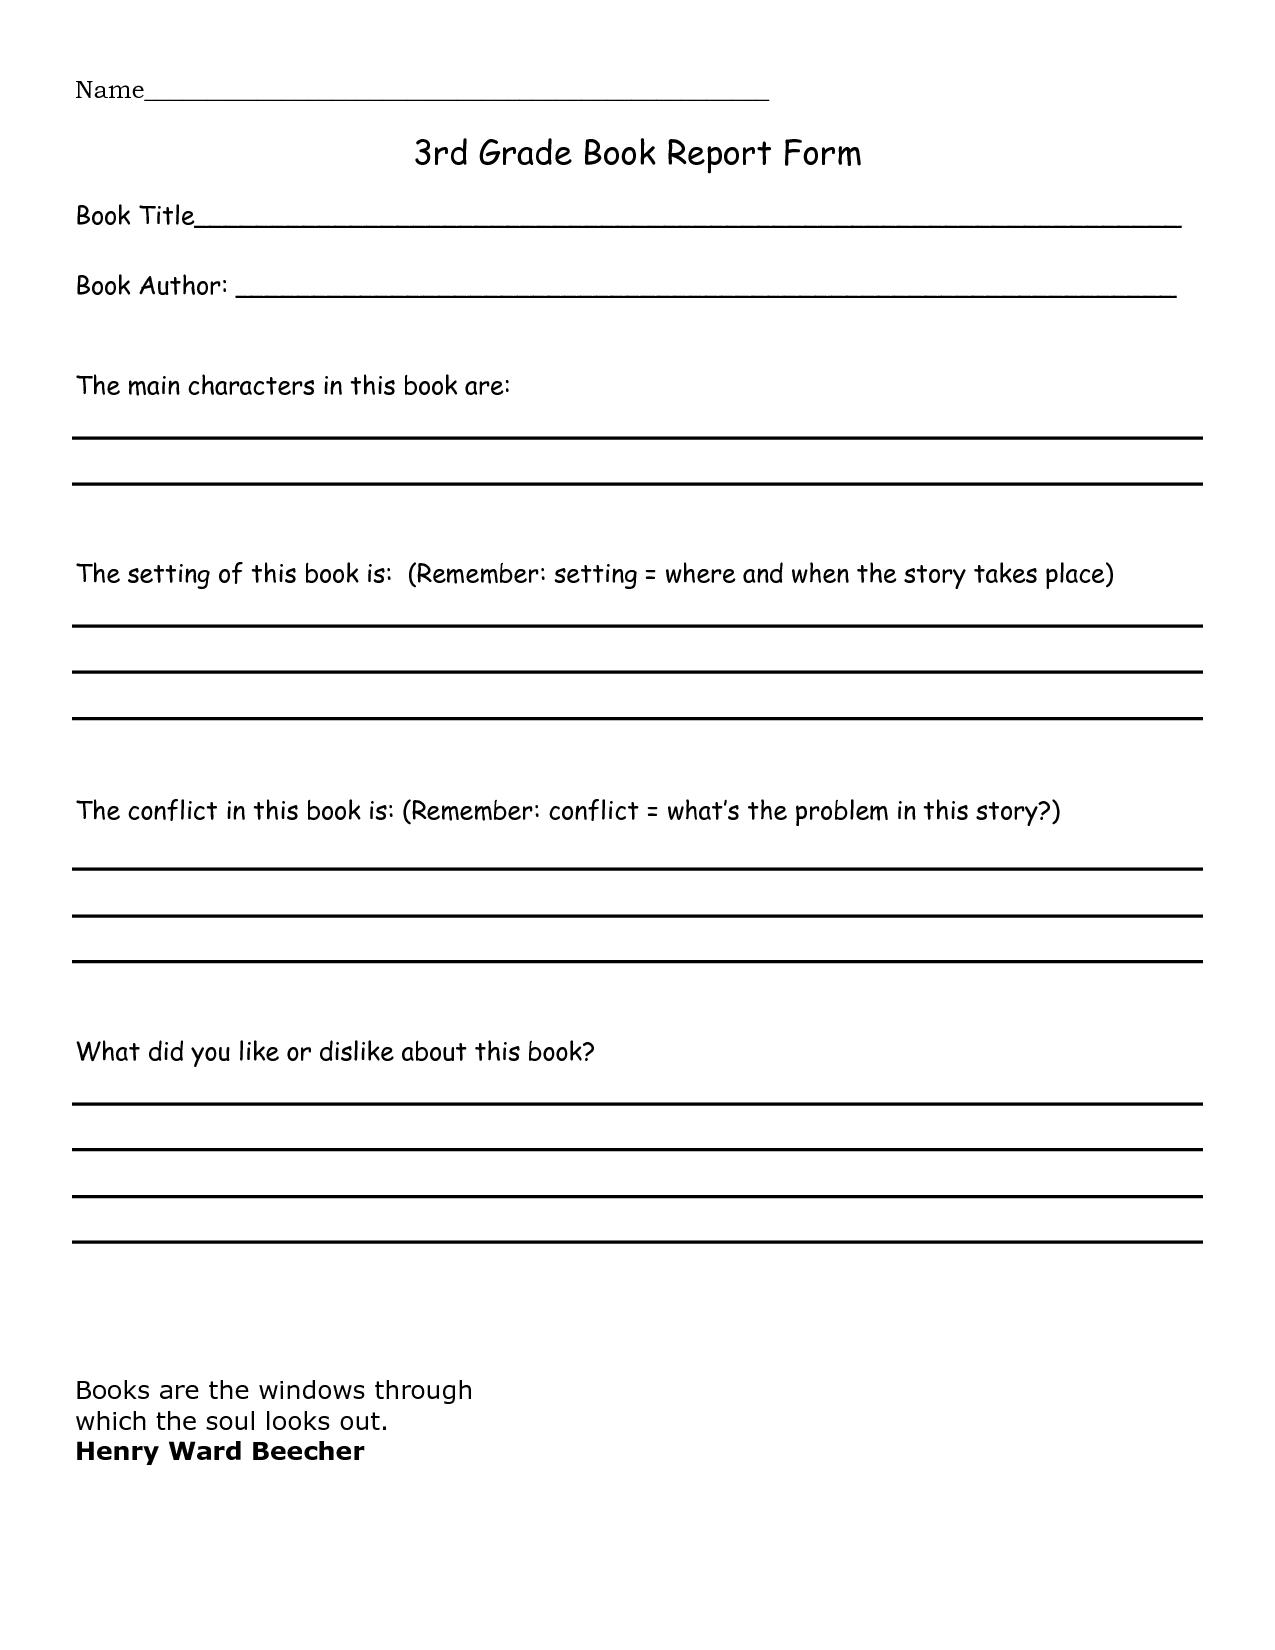 Book Report 3rd Grade Template